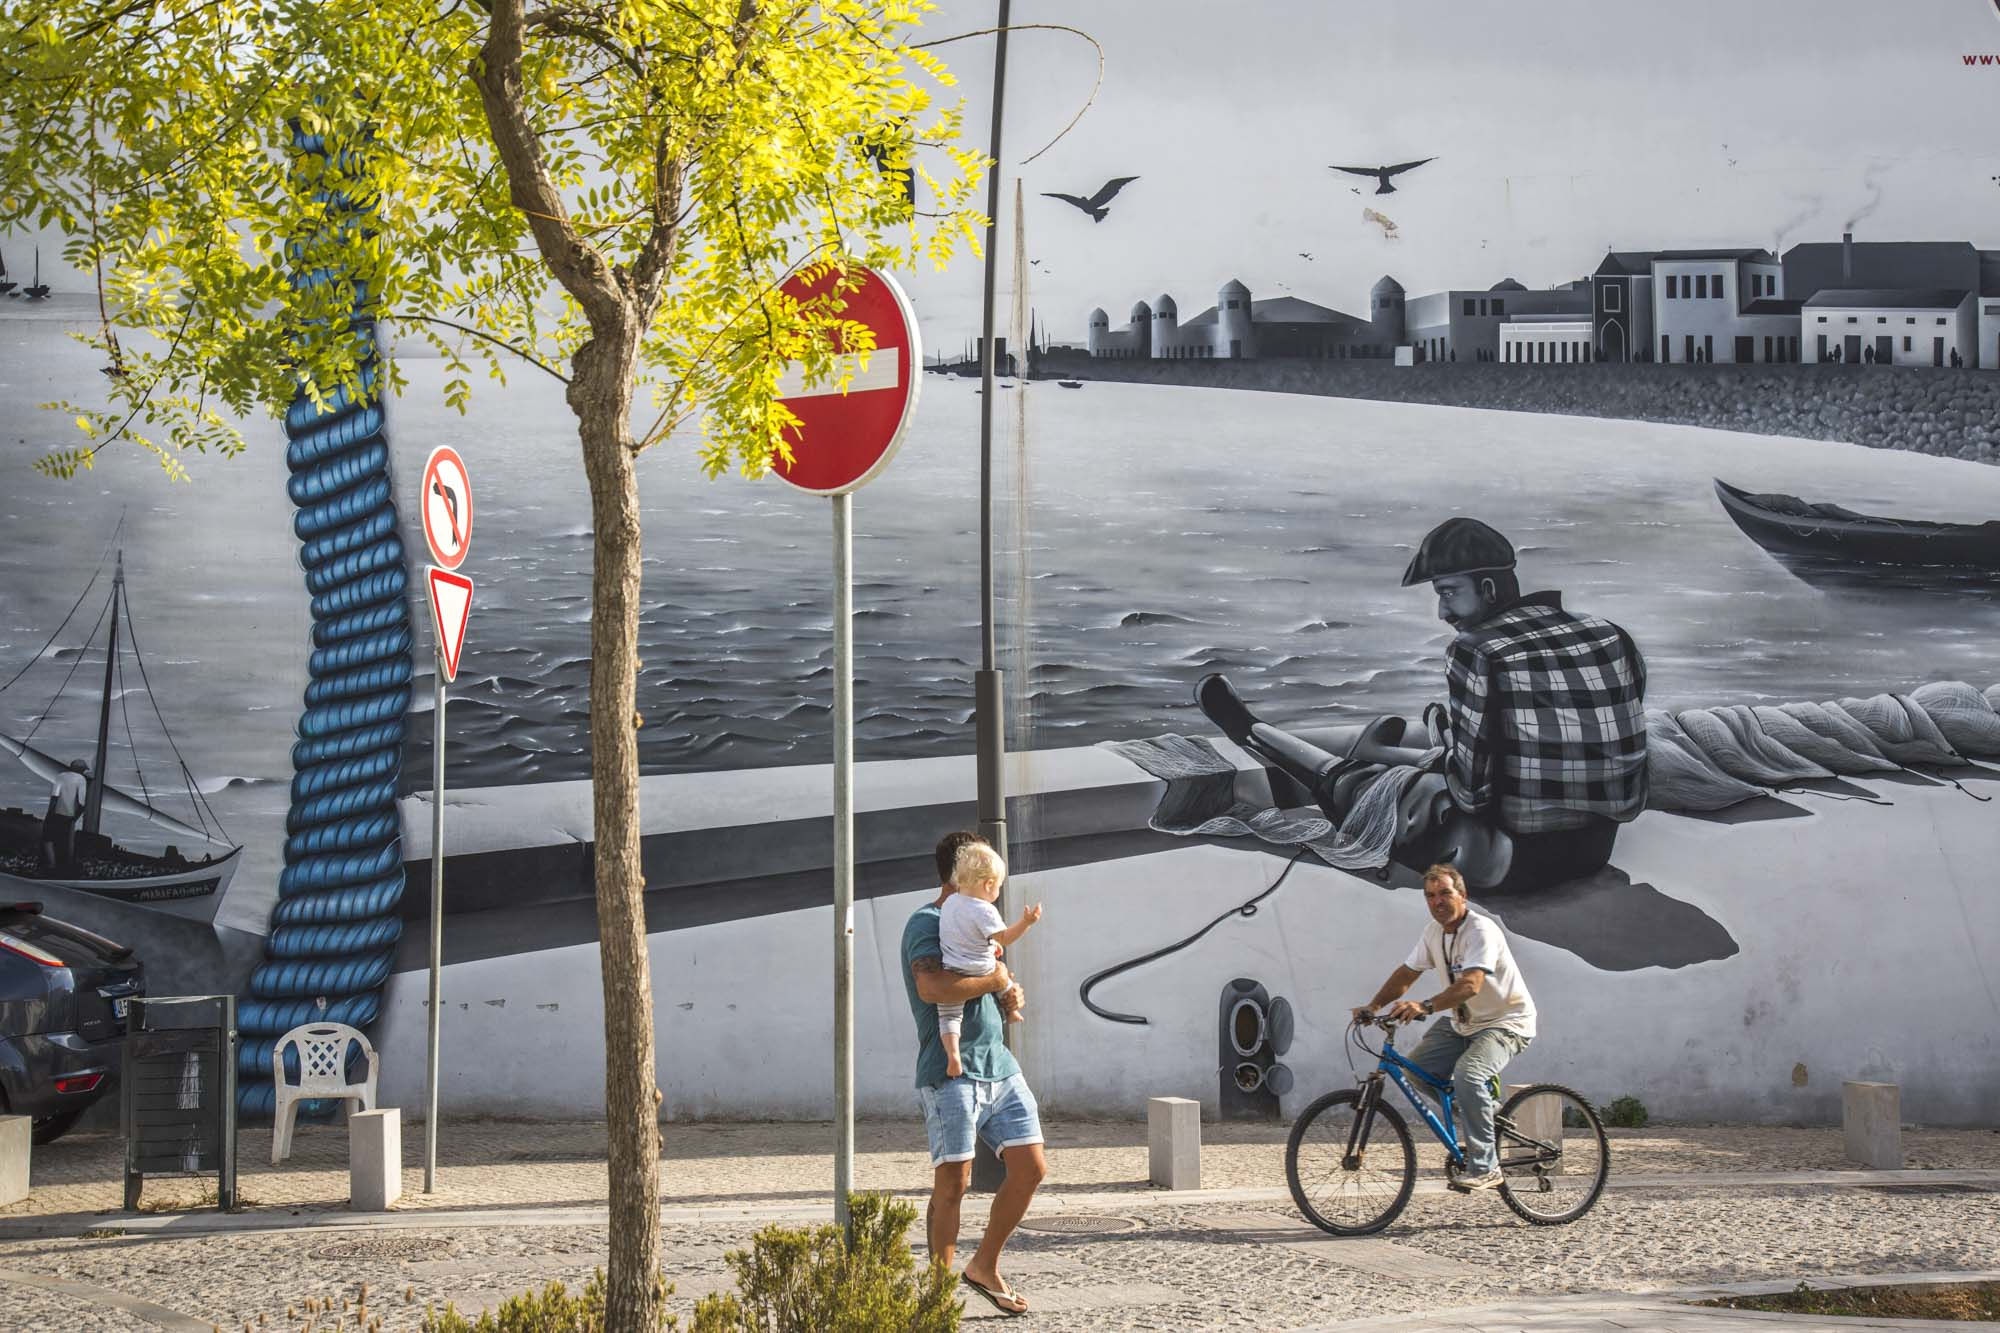 Portugal, Algarve, Olhão, Graffiti, Wandmalerei, Fischerdorf Motive